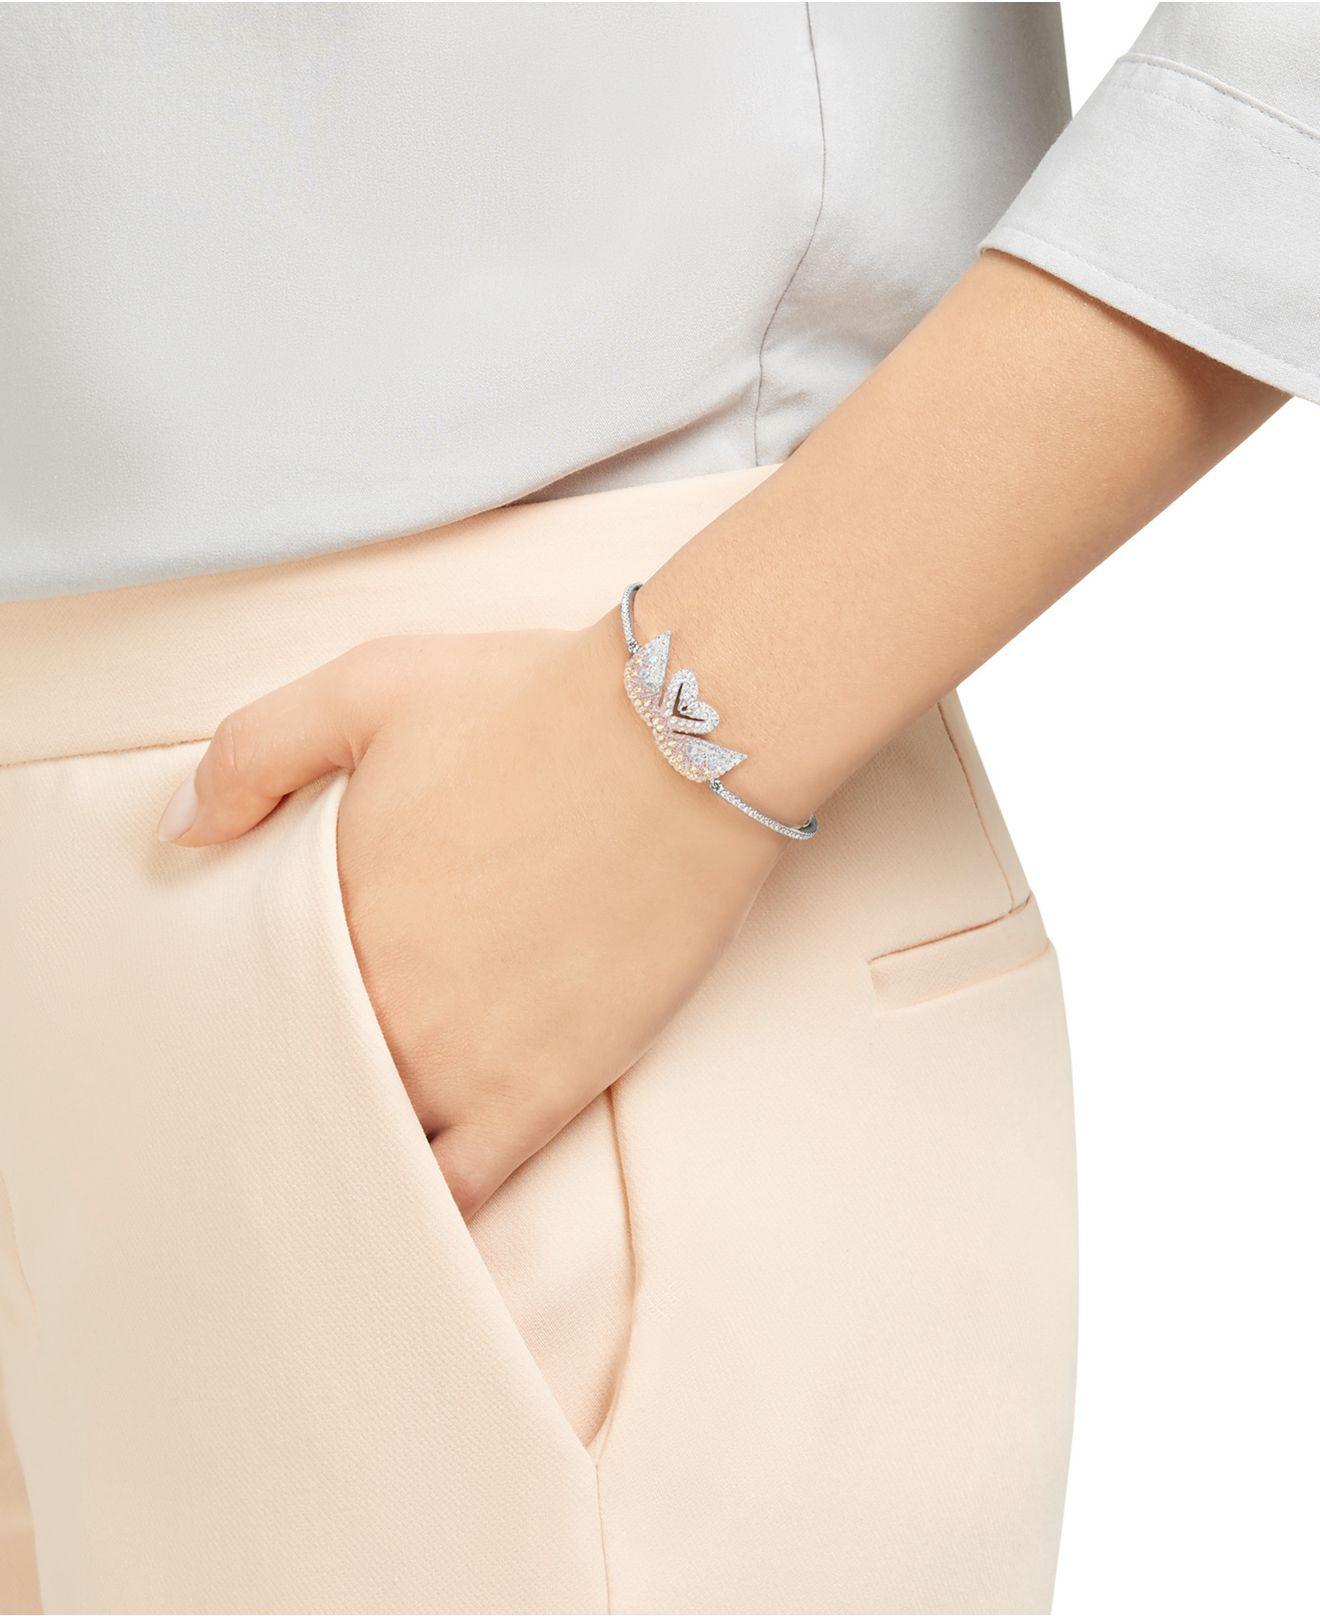 24e7cf4a2ed19 Lyst - Swarovski Iconic Swan Bracelet in Metallic - Save 25.443786982248525%